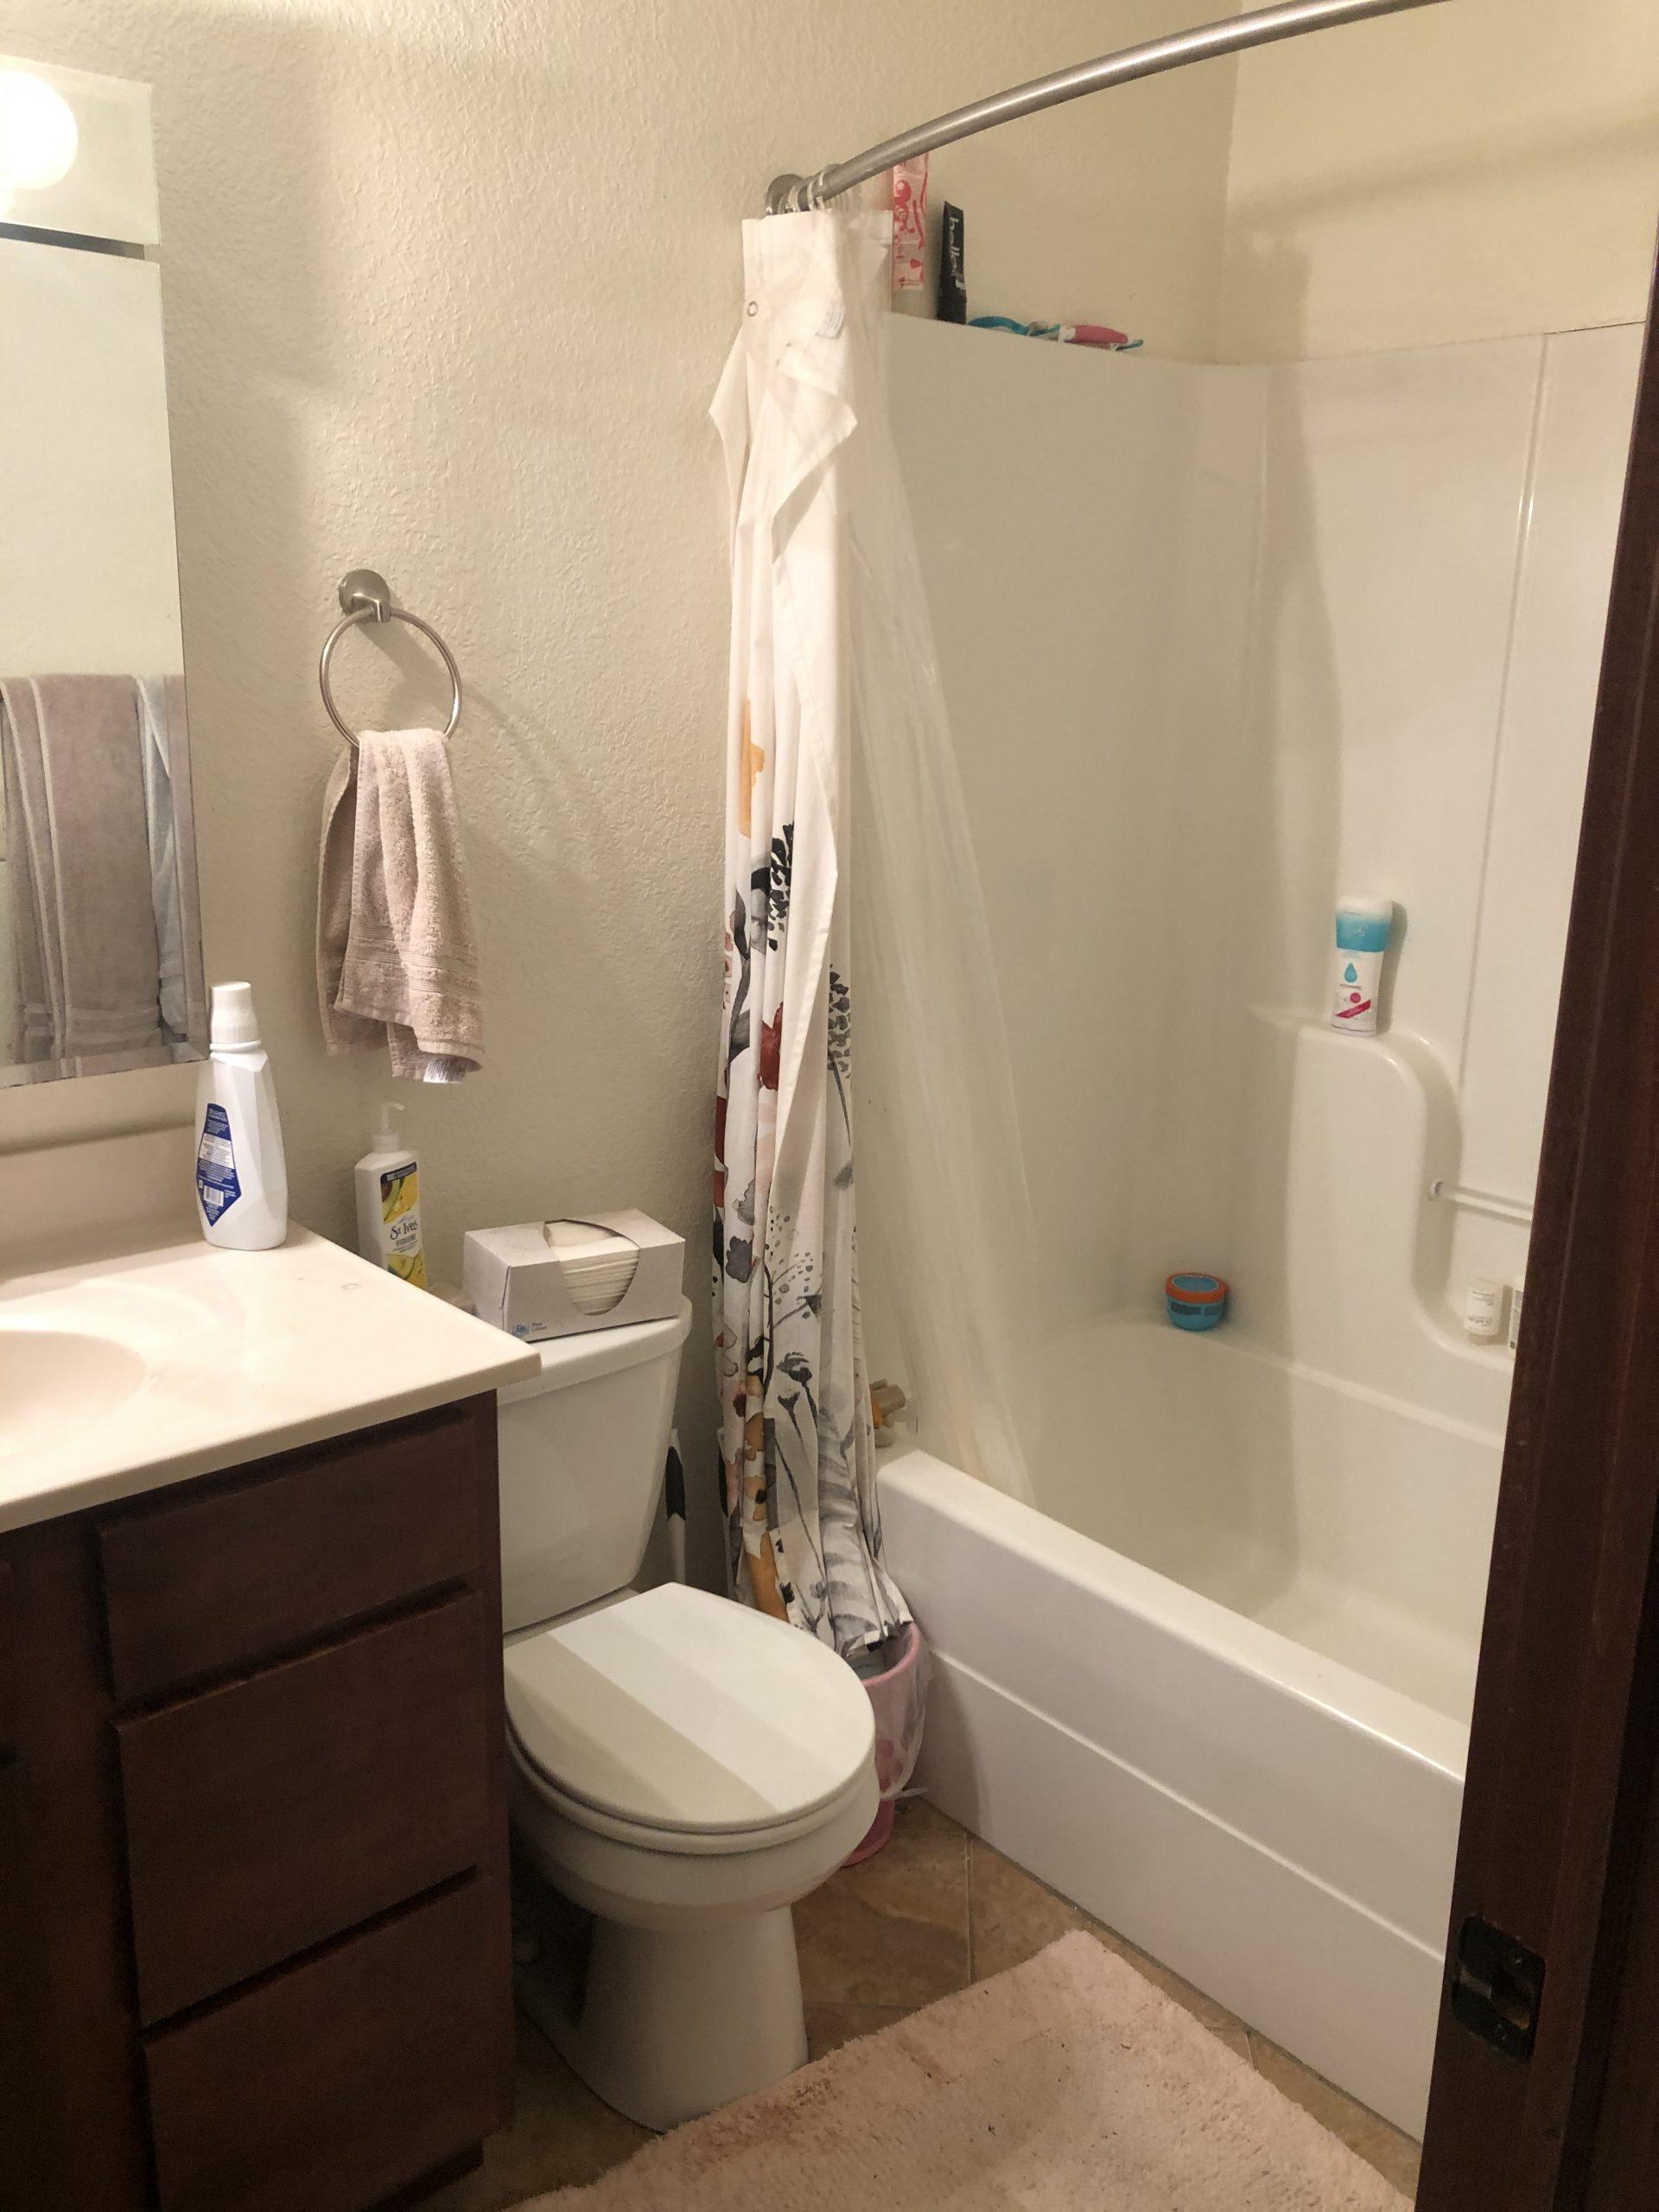 515-college-1_iowa-city_j-and-j-apartments_bathroom